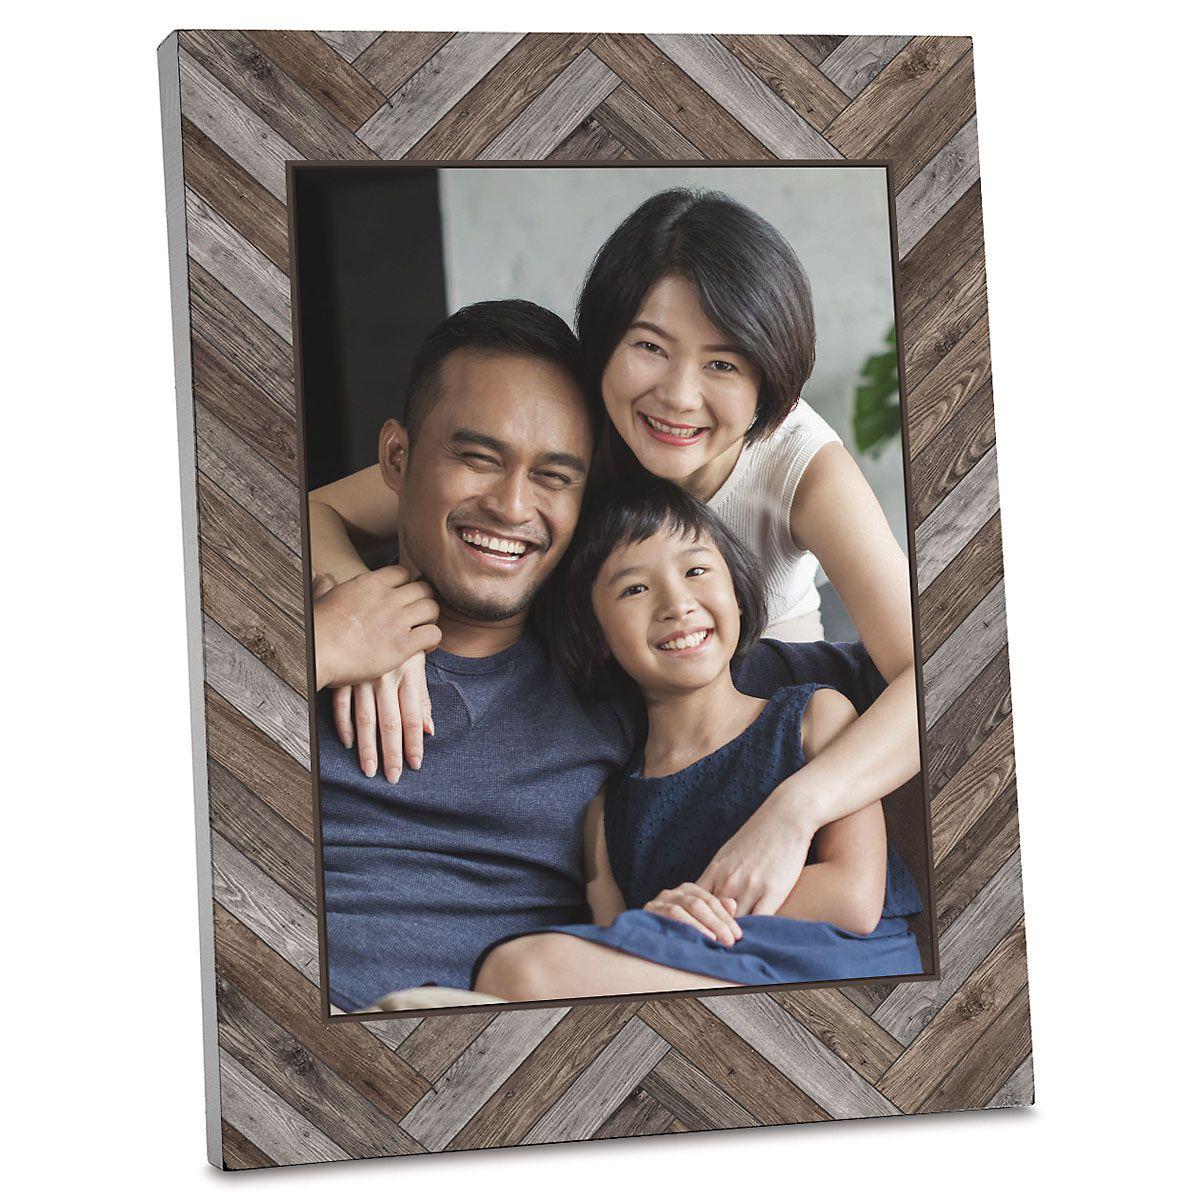 Chevron Personalized Wood Photo Plaque